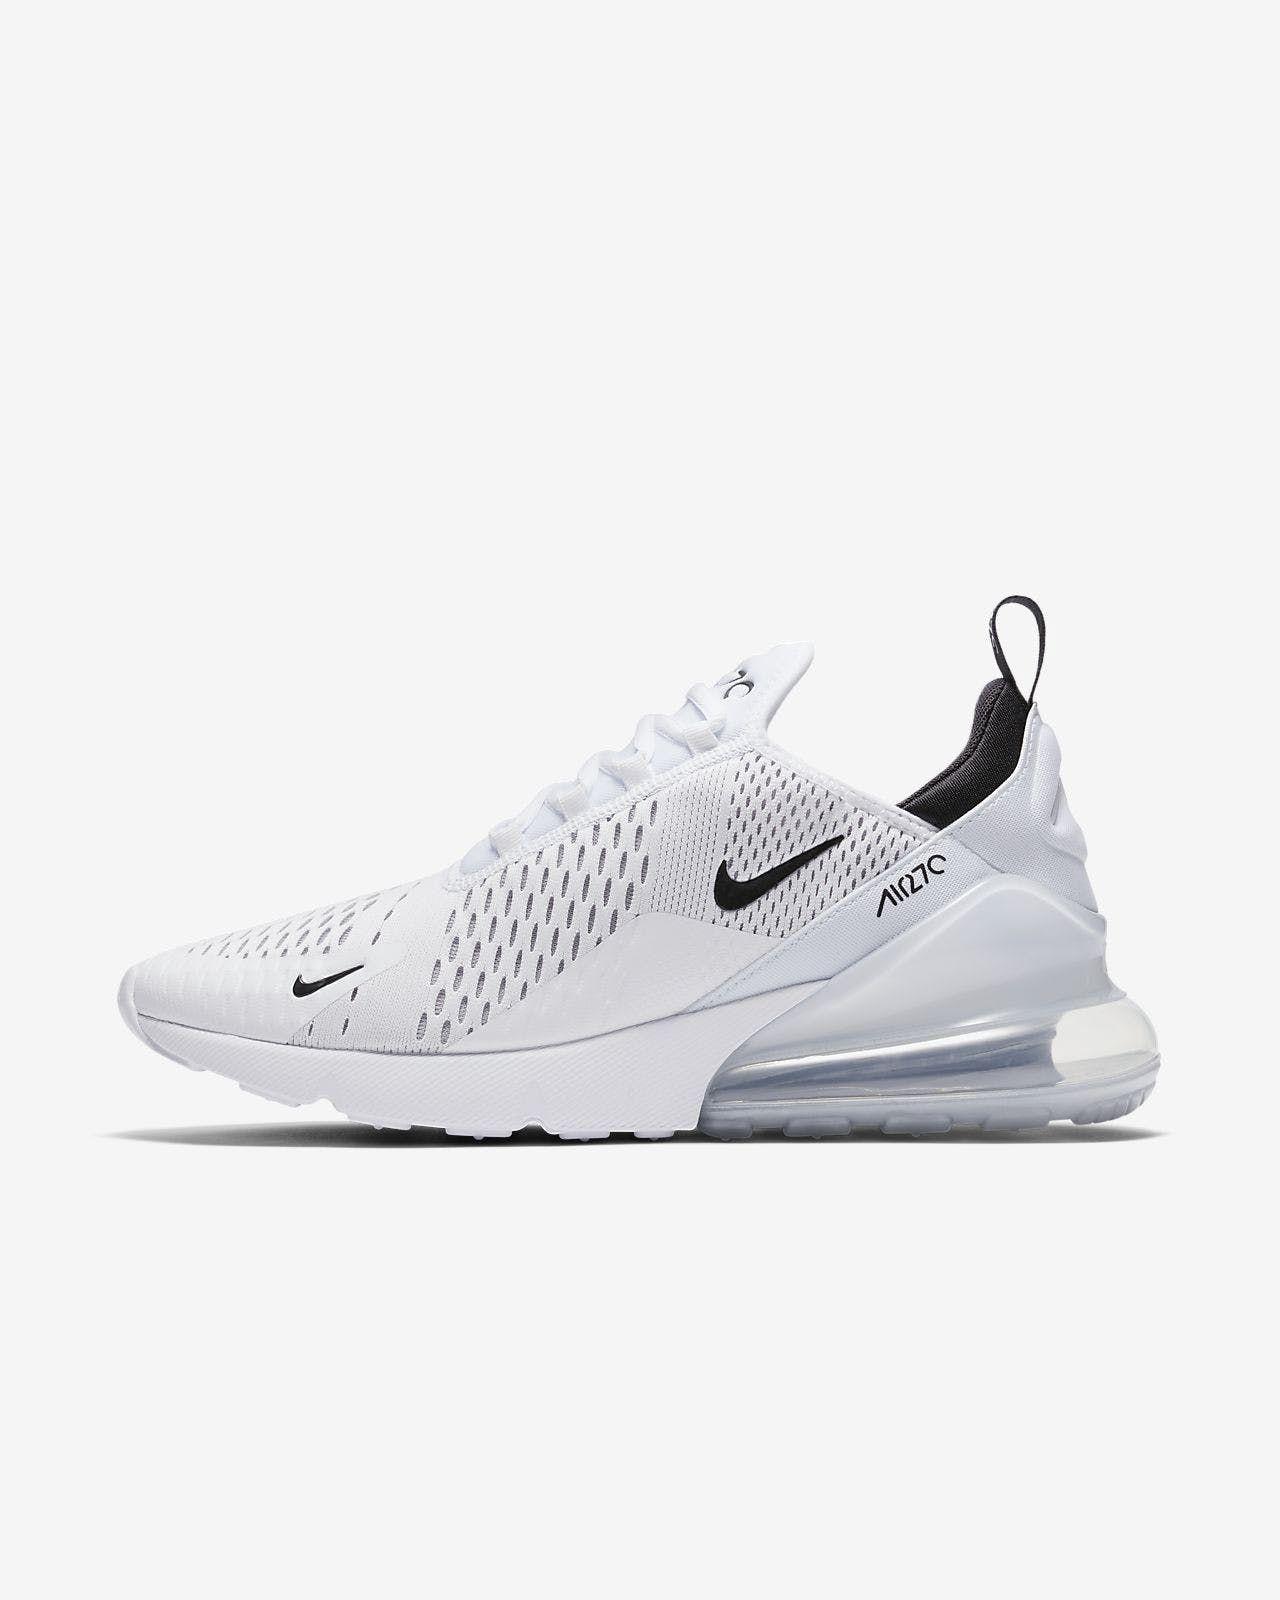 Nike Air Max 270 Men's Shoe | zapatos | Zapatos nike